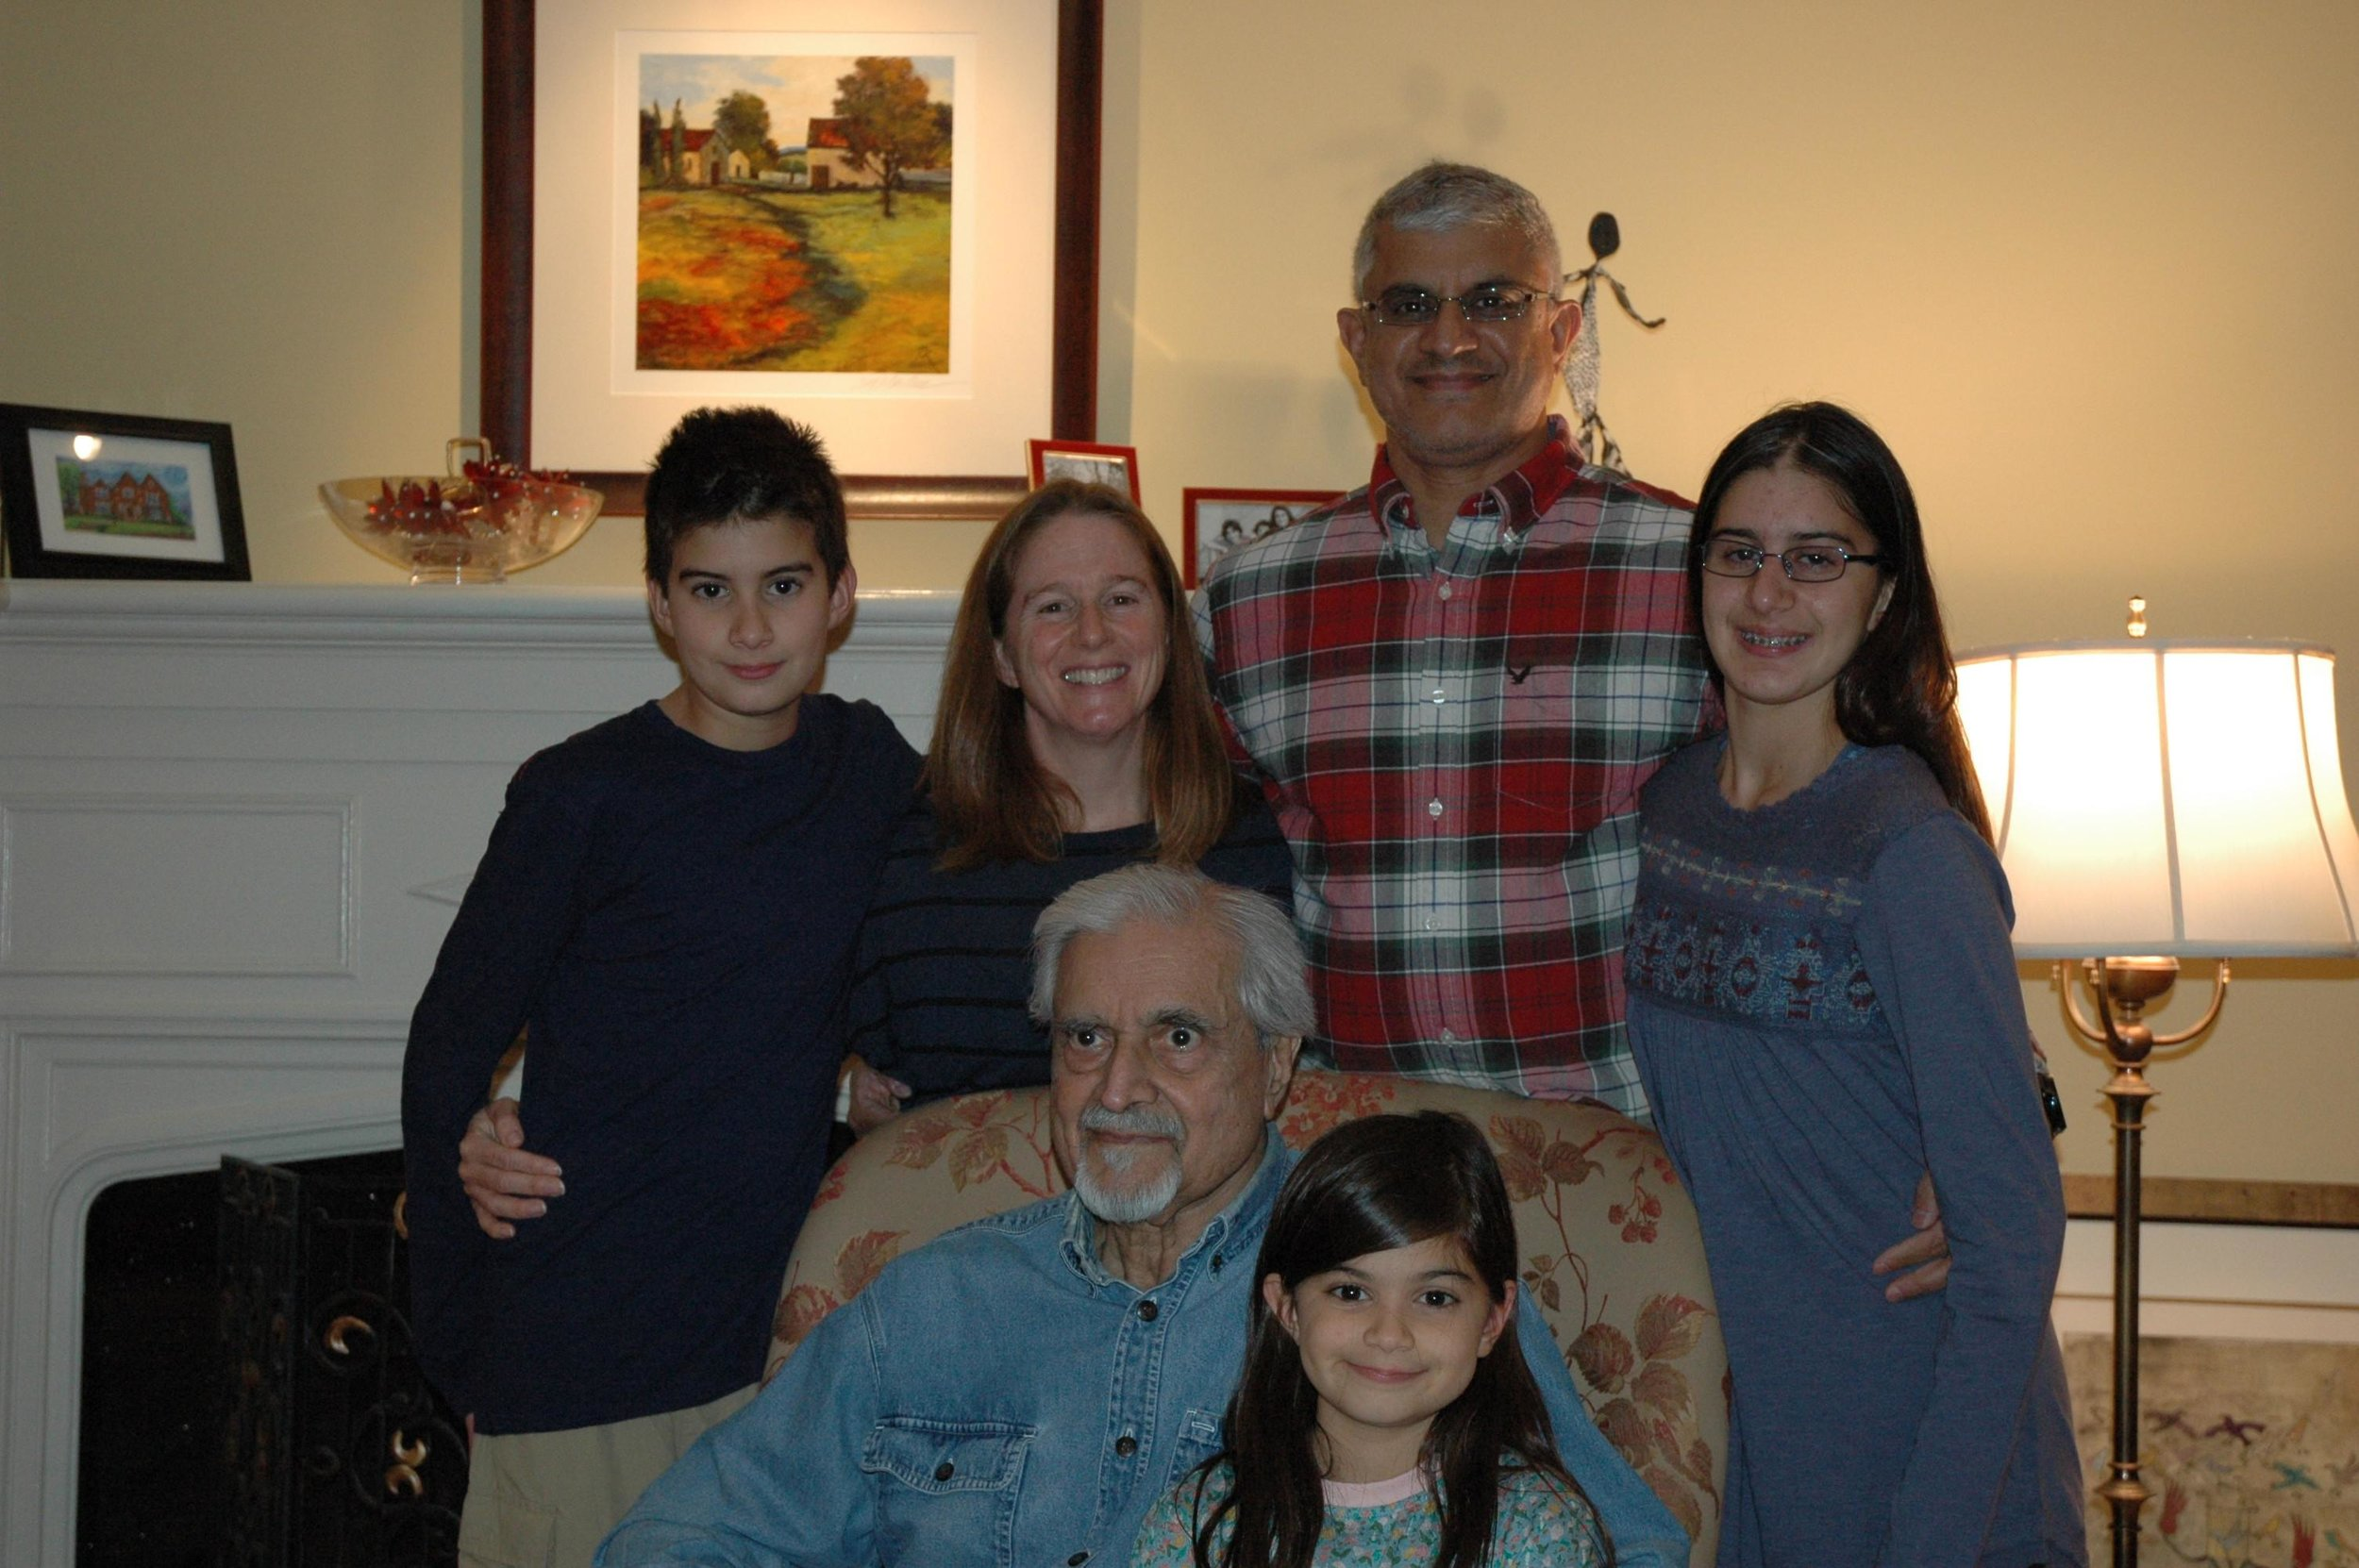 Asie, Kim, Z, Aliya in back. Z's dad and Amira in front. Taken Thanksgiving 2016.